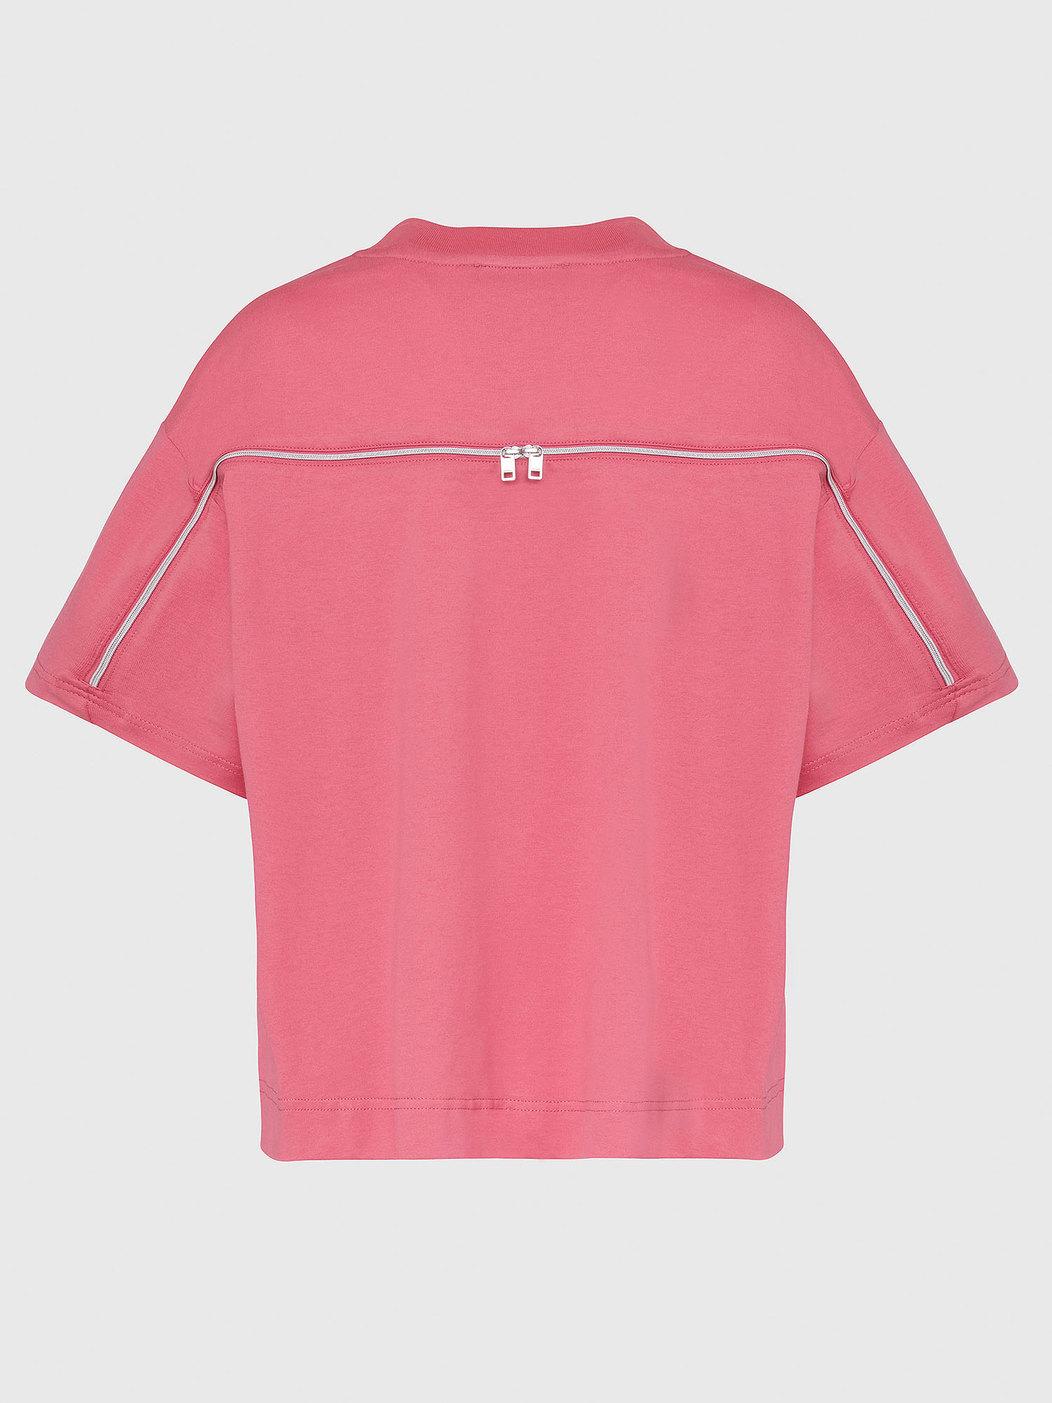 T-Shirt With Trompe L'Oeil Necklace